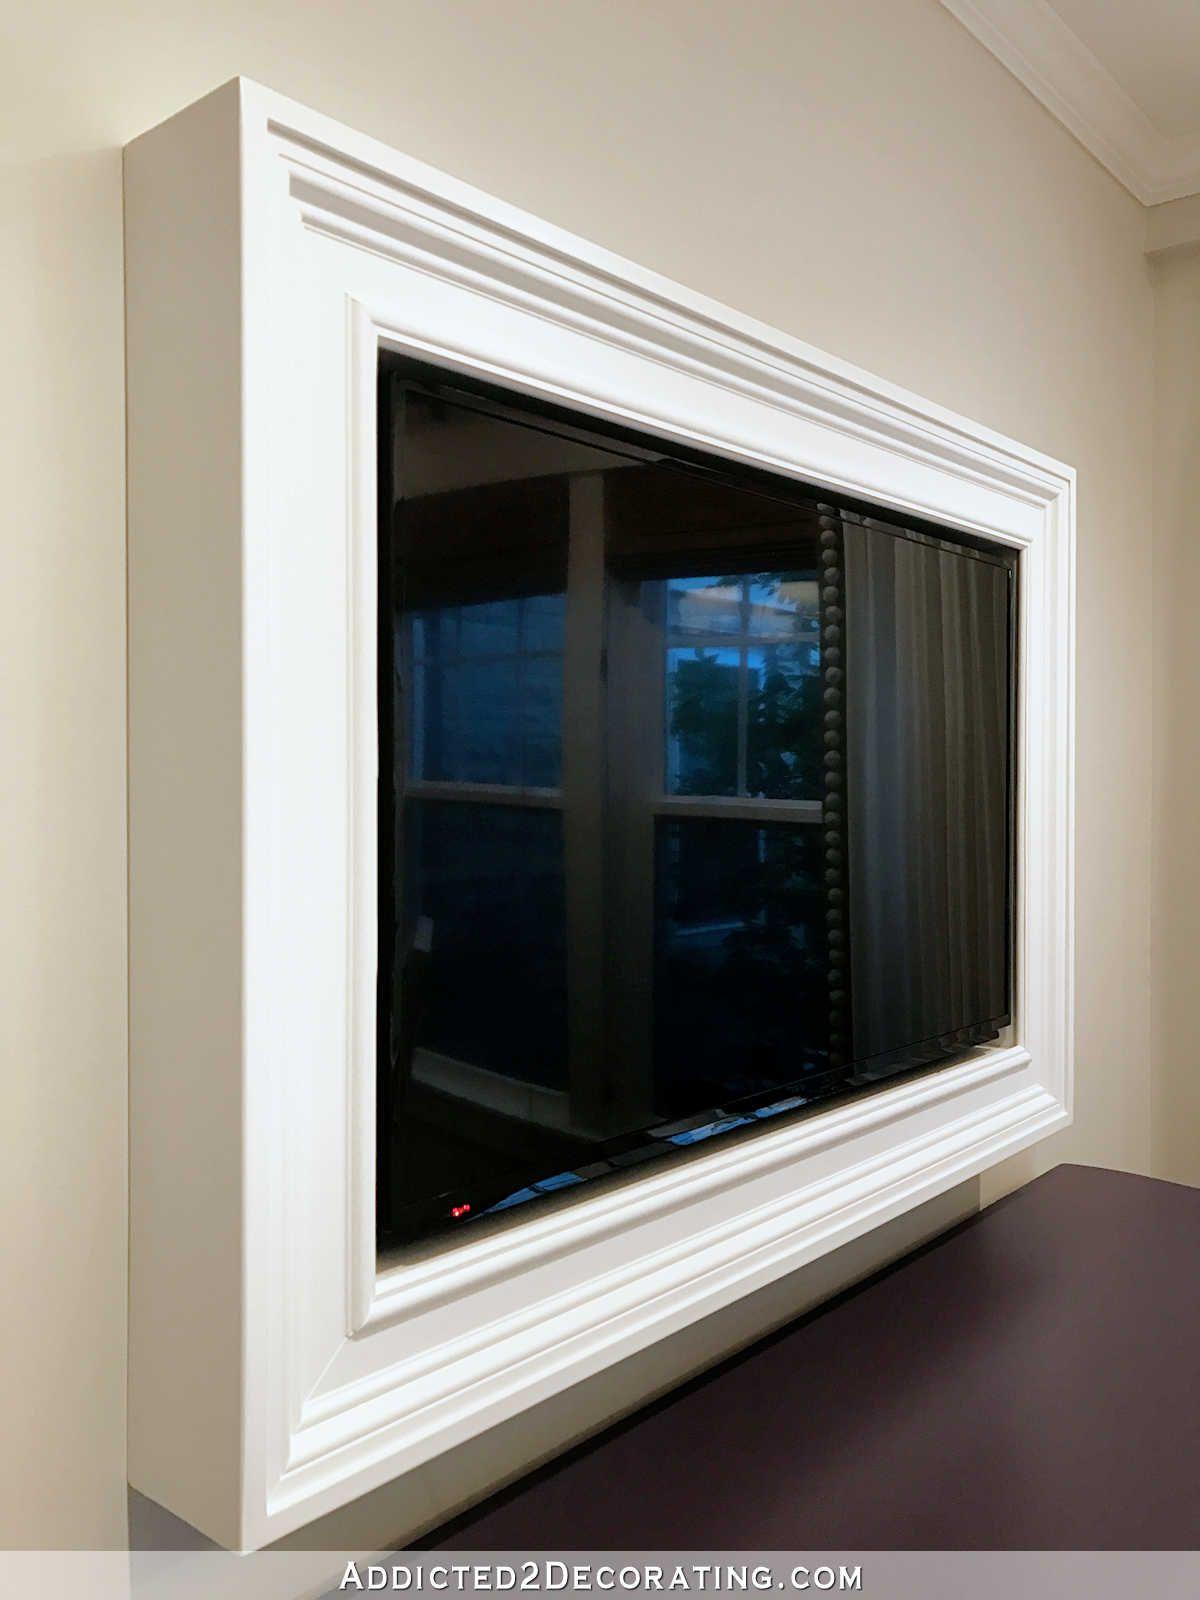 Custom diy frame for wallmounted tv finished decor